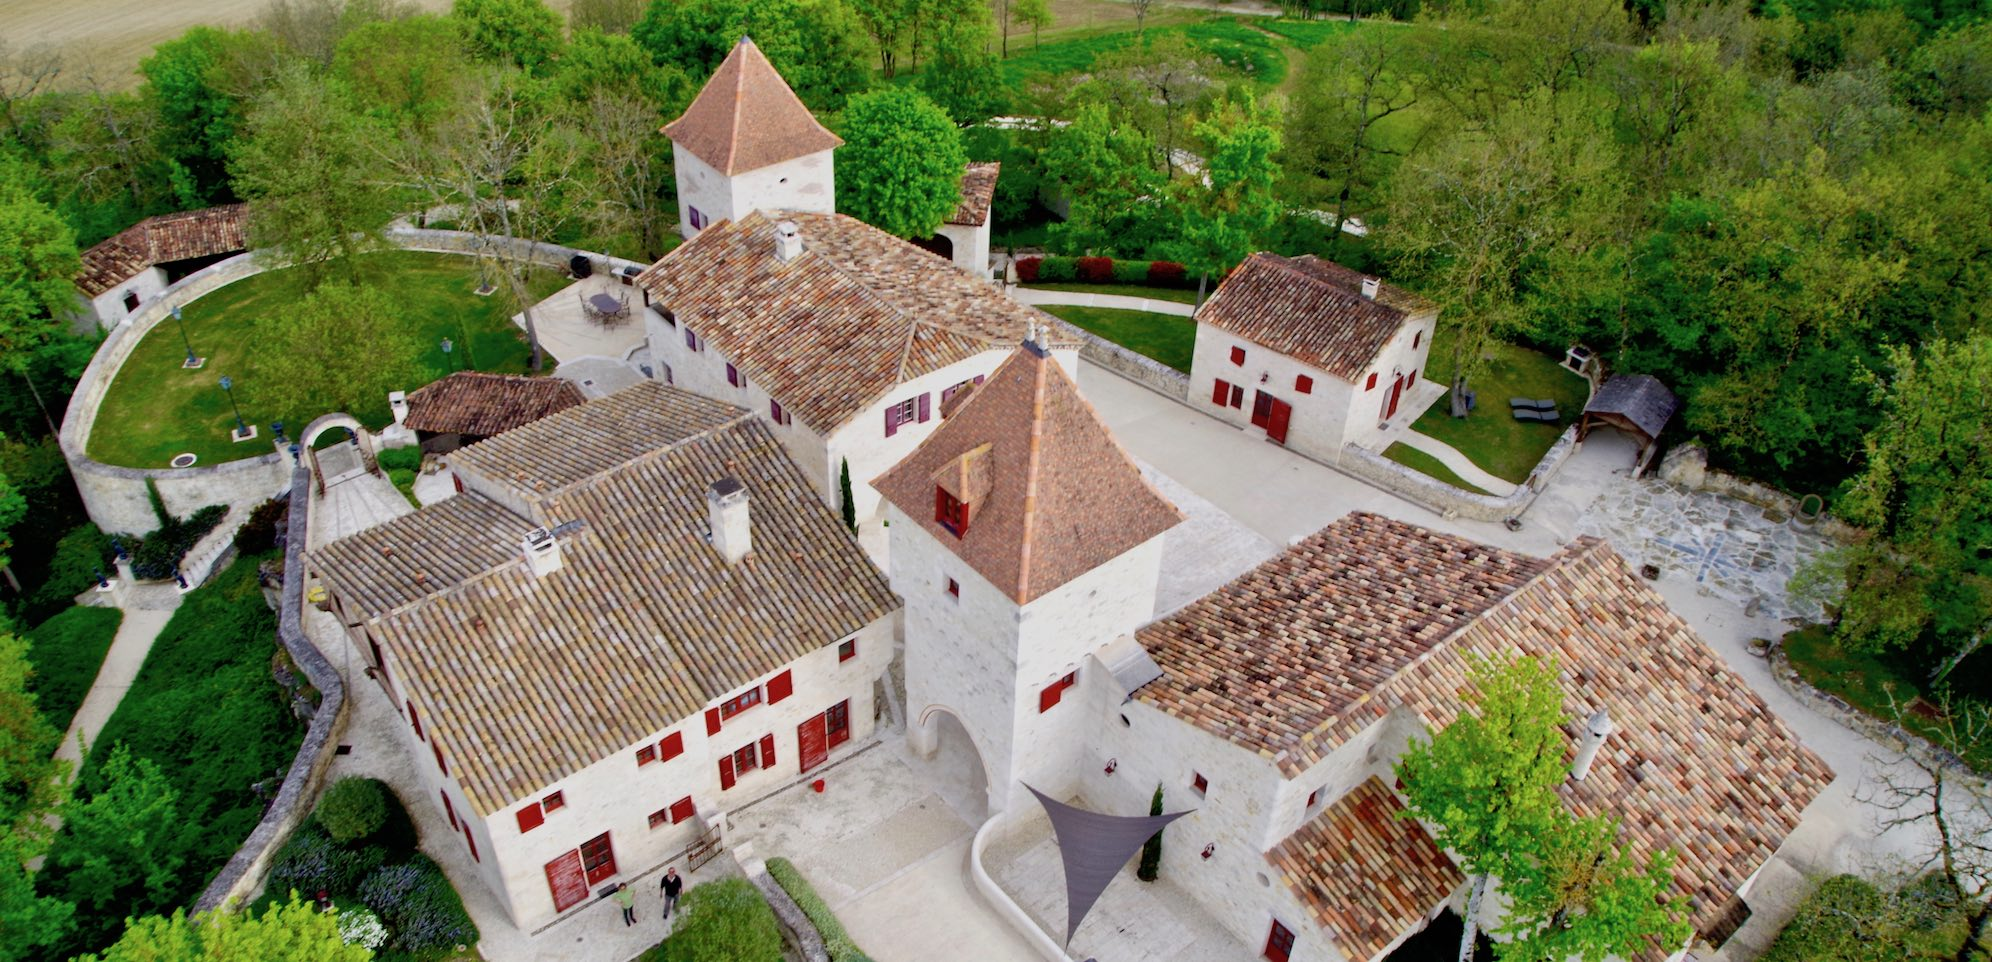 hameau guirauton vu du ciel jeune confort luxe 2000x960 - Gers - Château de Guirauton